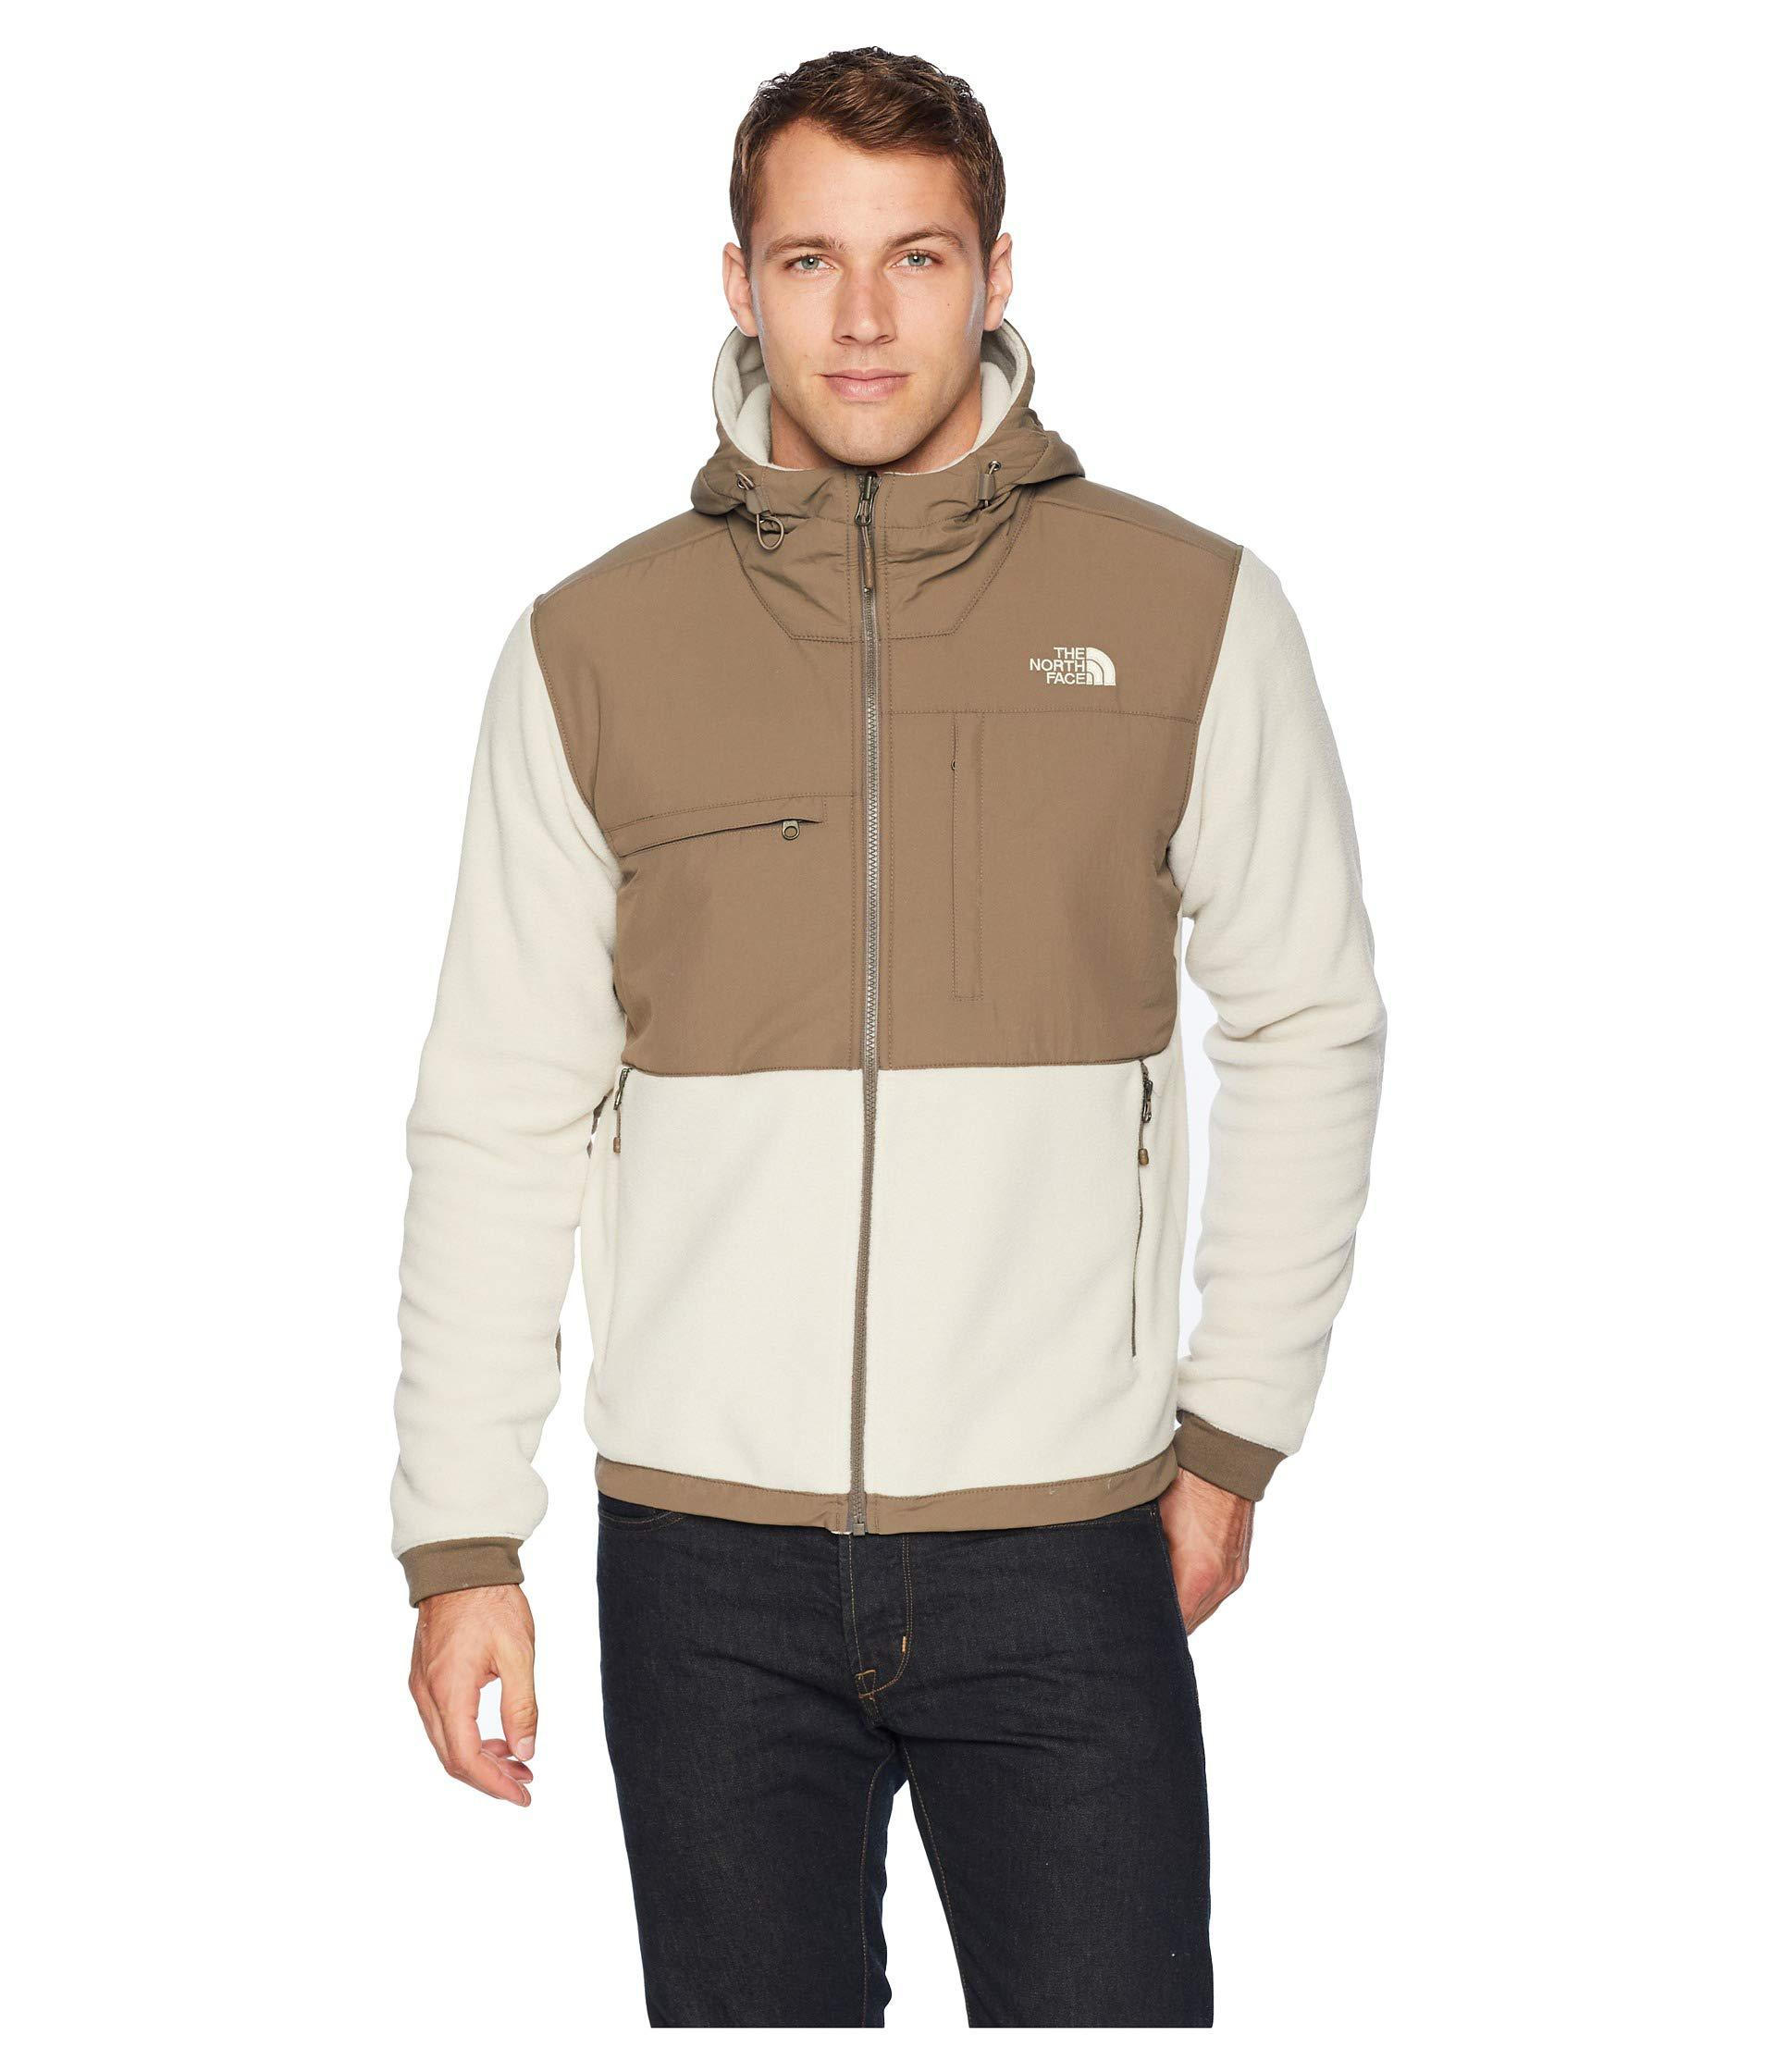 faf3984bd The North Face Natural Denali 2 Hoodie (peyote Beige/weimaraner Brown 1)  Men's Sweatshirt for men